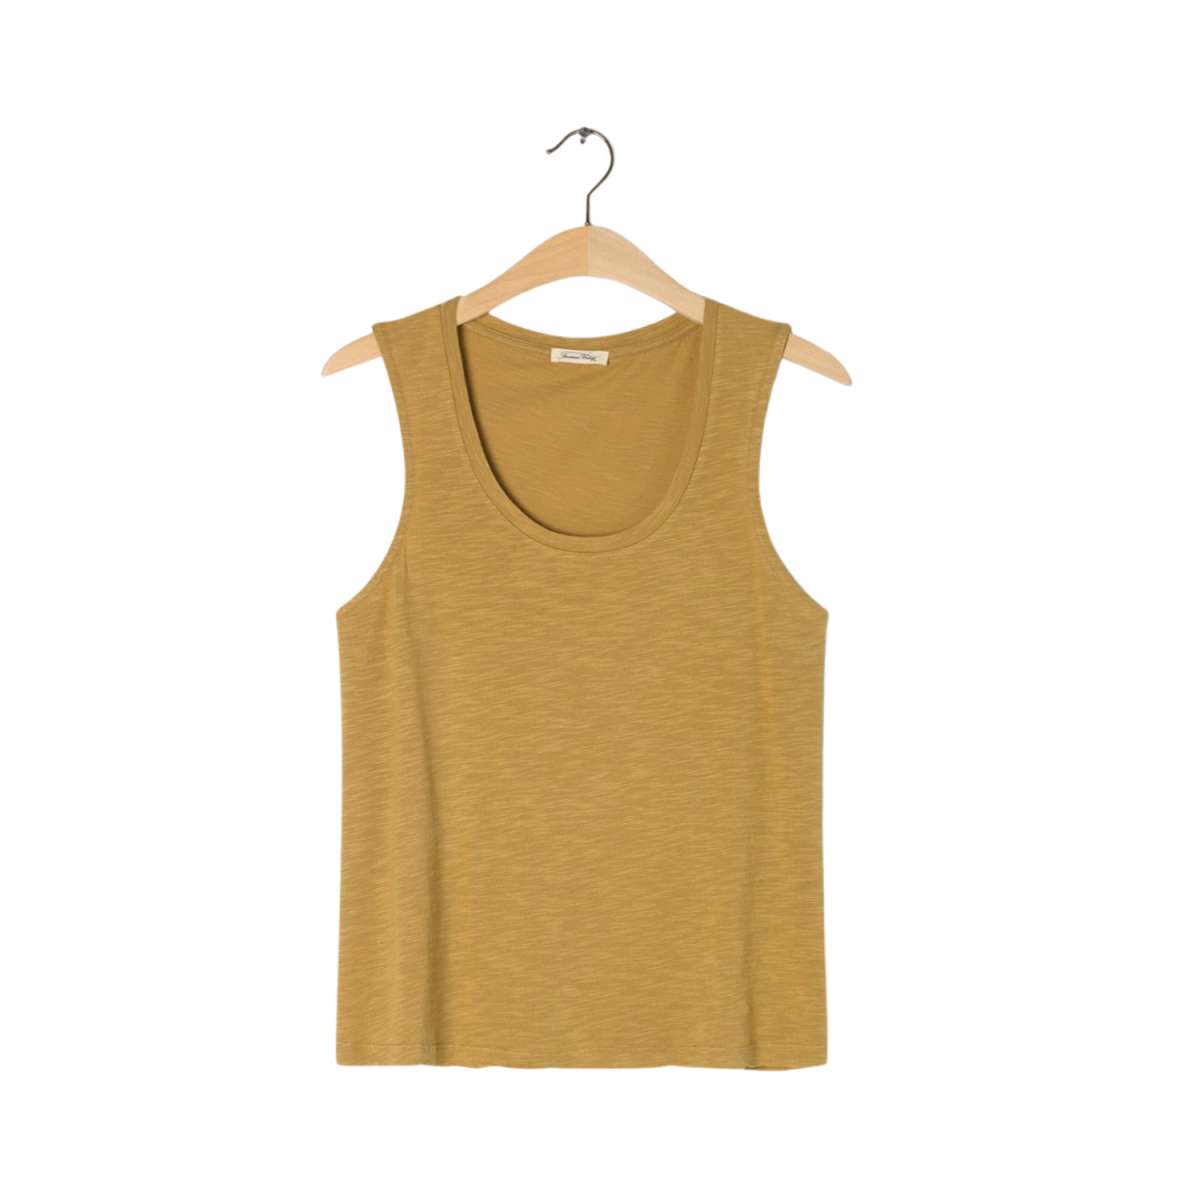 jacksonville strop - vintage camello t-shirt